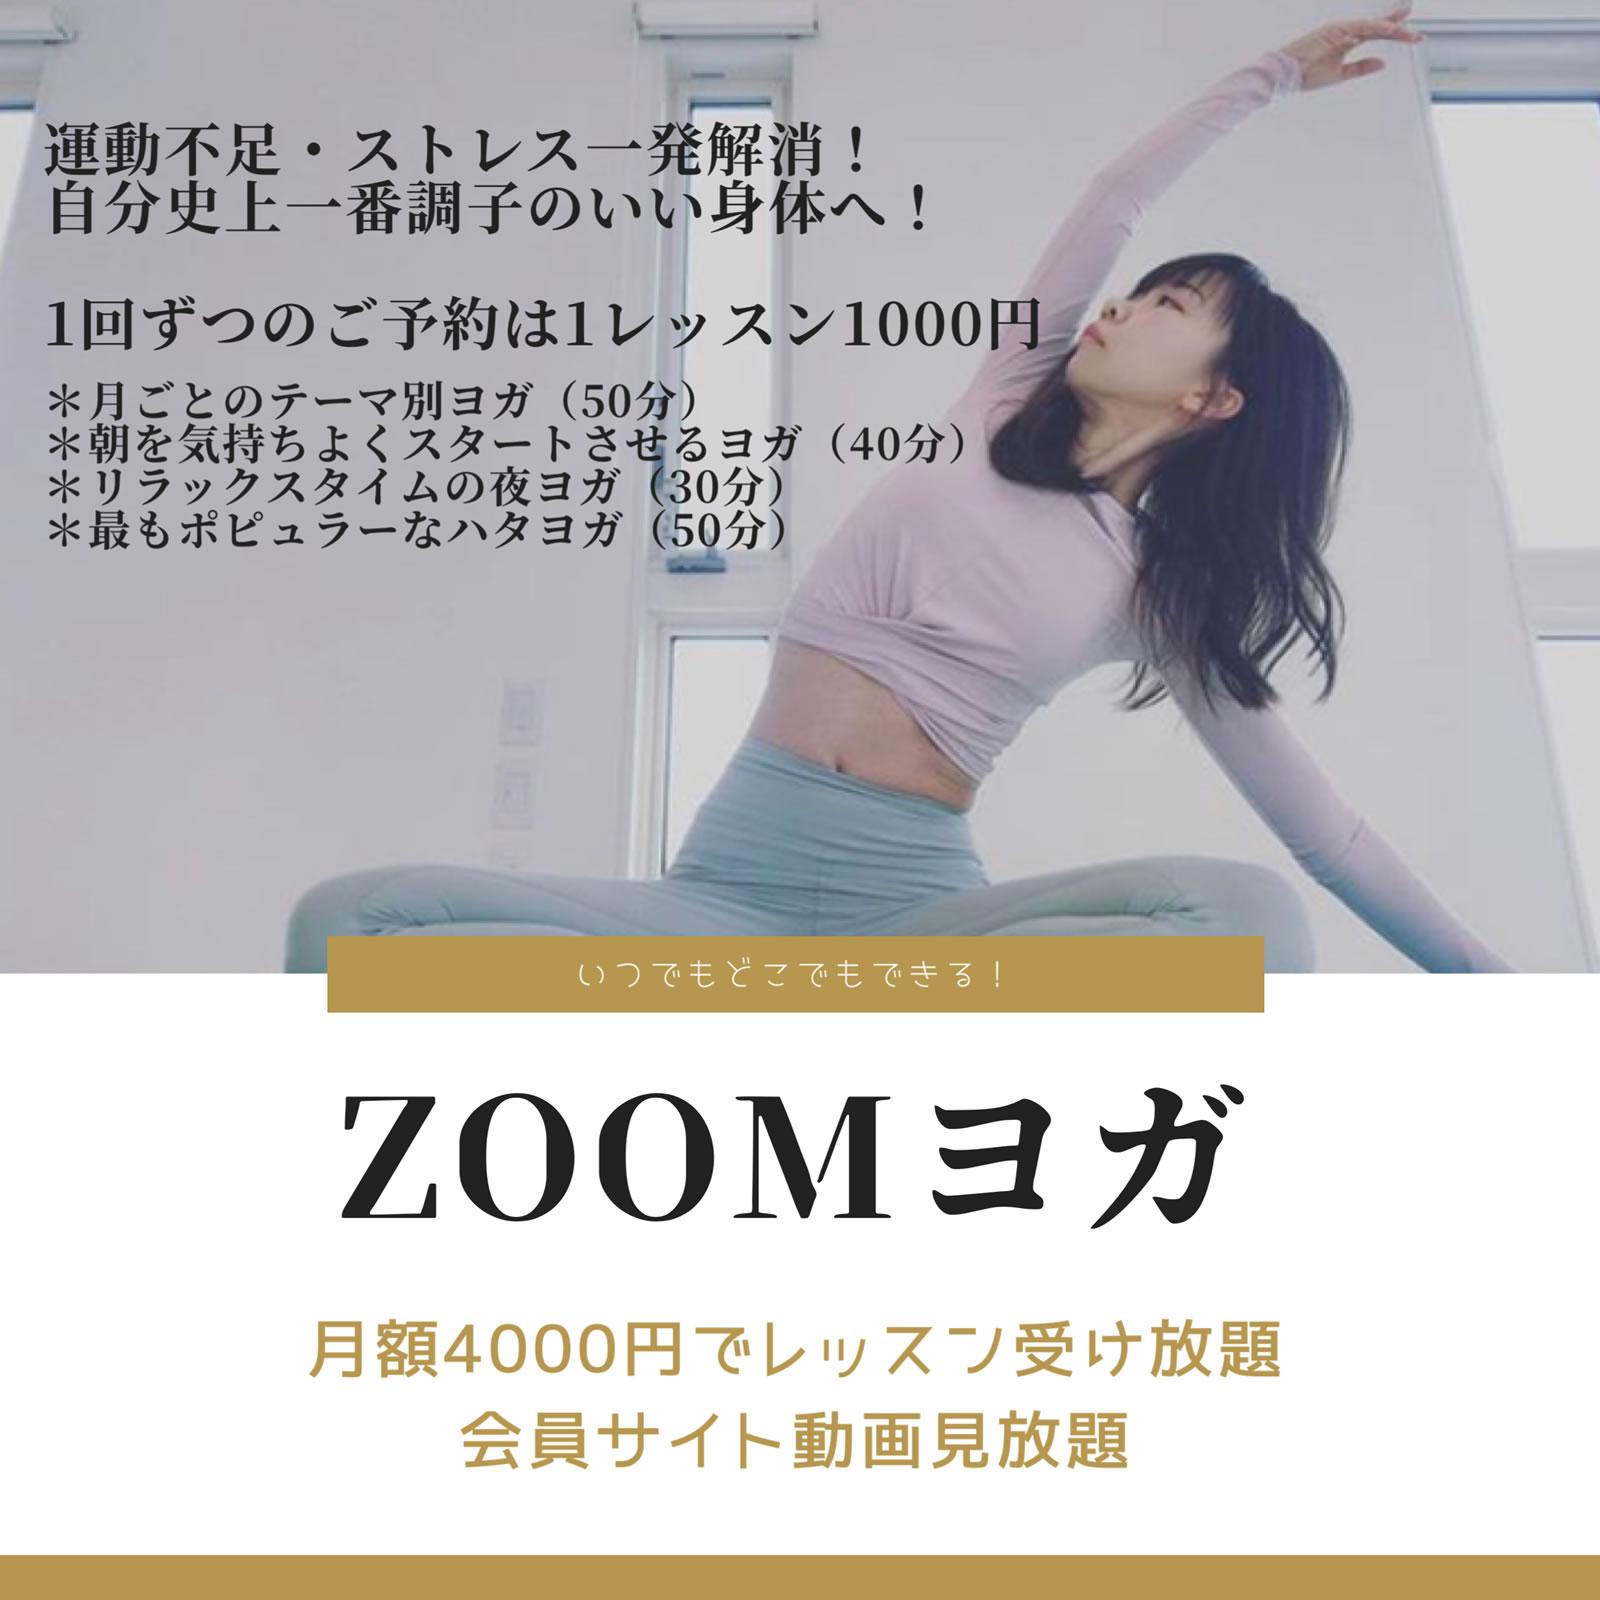 ZOOMヨガ 月額4,000円でレッスン受け放題 運動不足・ストレス一発解消!自分史上一番調子のいい身体へ!「いつでもどこでもできる!ZOOMヨガ」